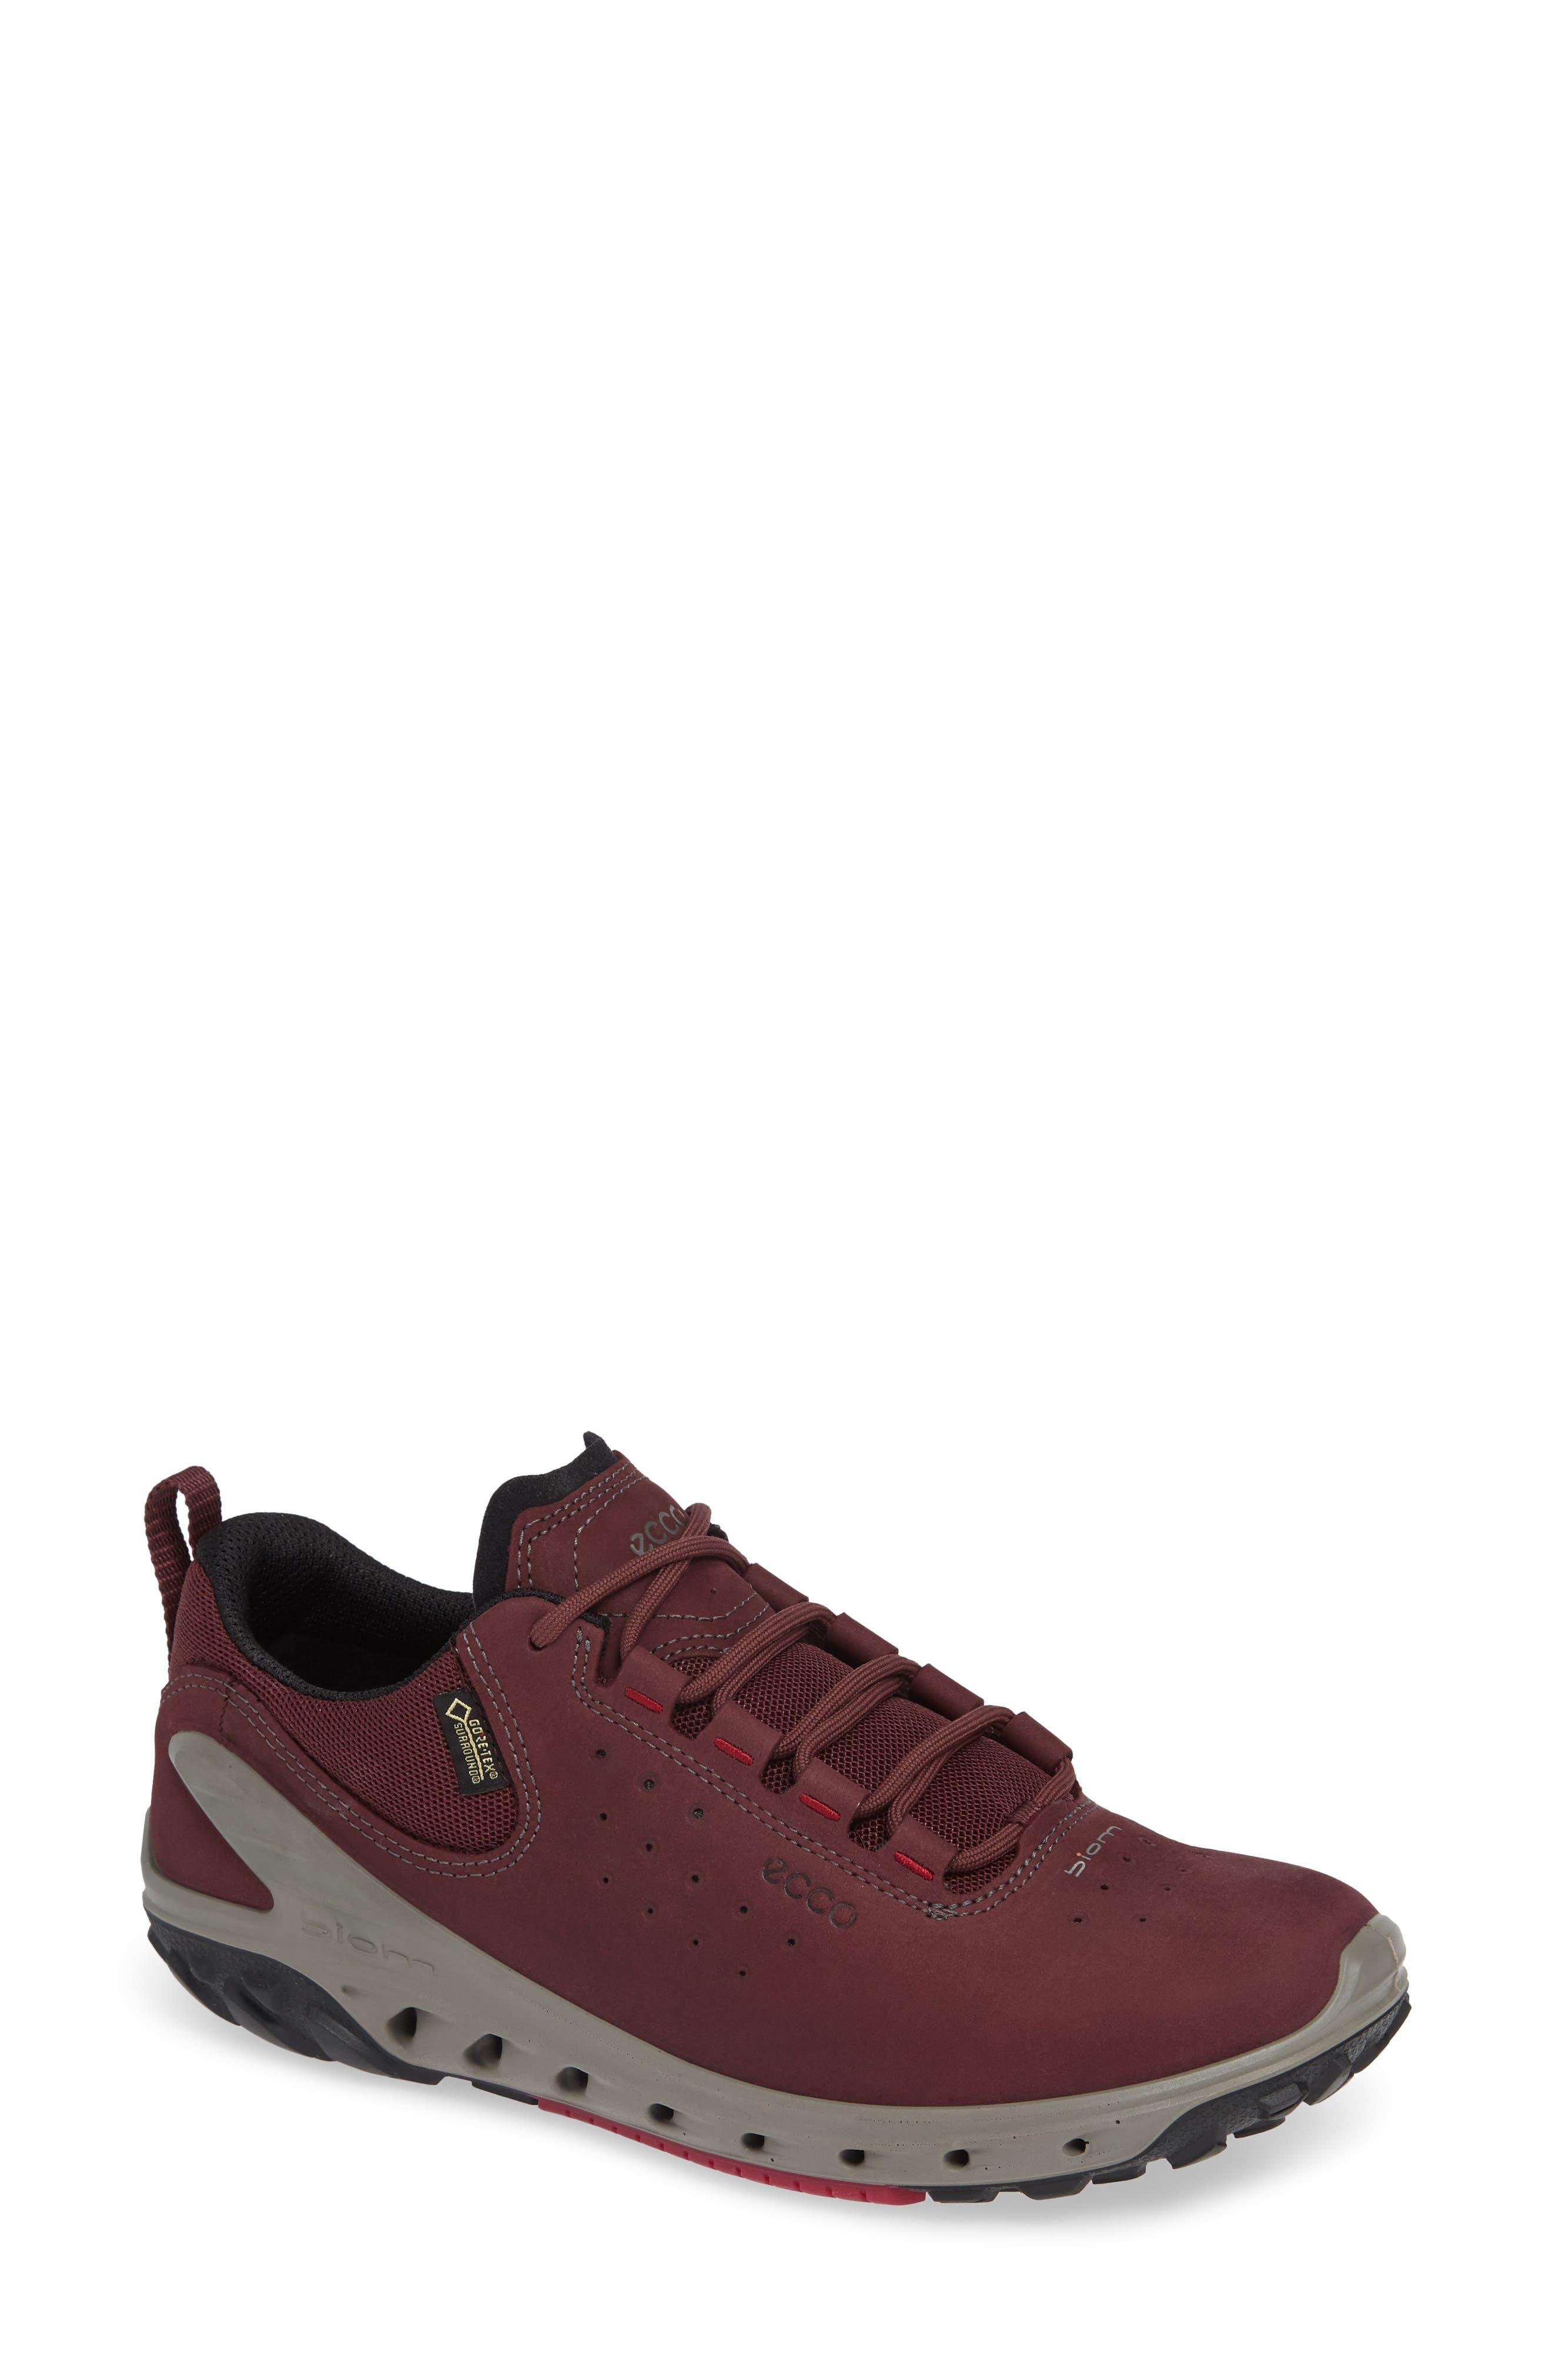 BIOM Venture GTX Sneaker,                         Main,                         color, WINE NUBUCK LEATHER